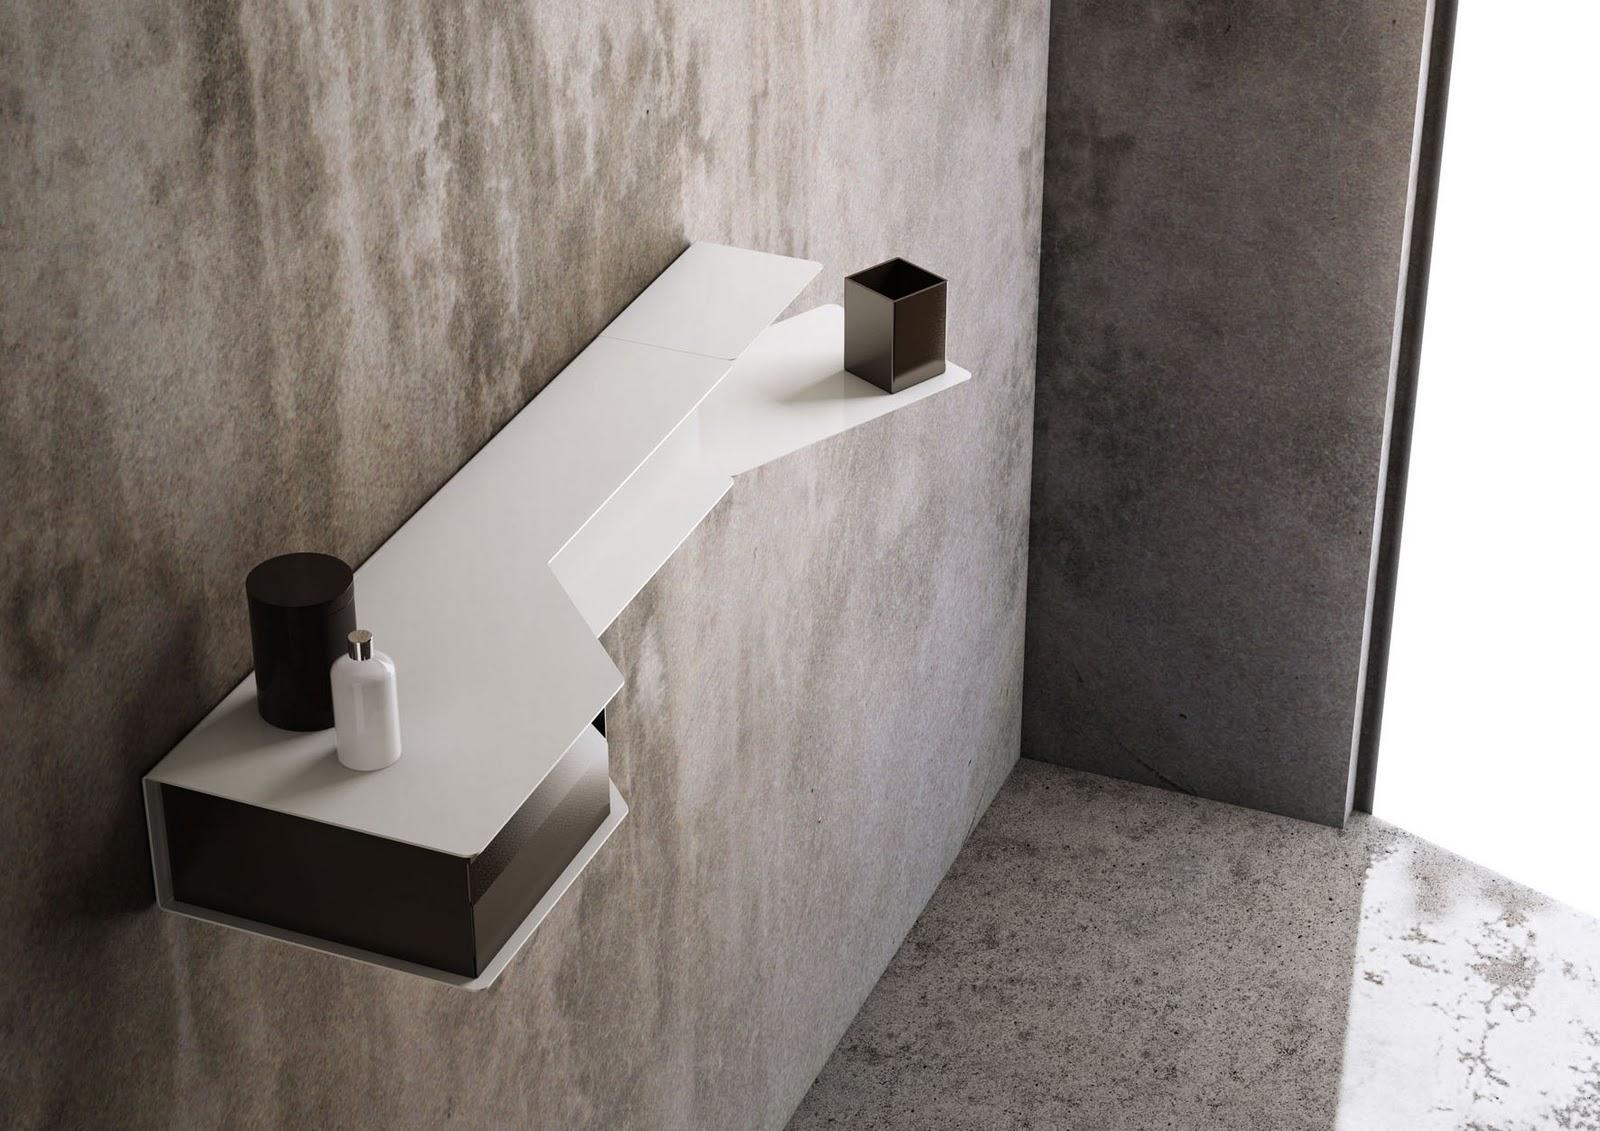 Arredo bagno design: OBLIQUE by Hangar Design Group per Valli ...